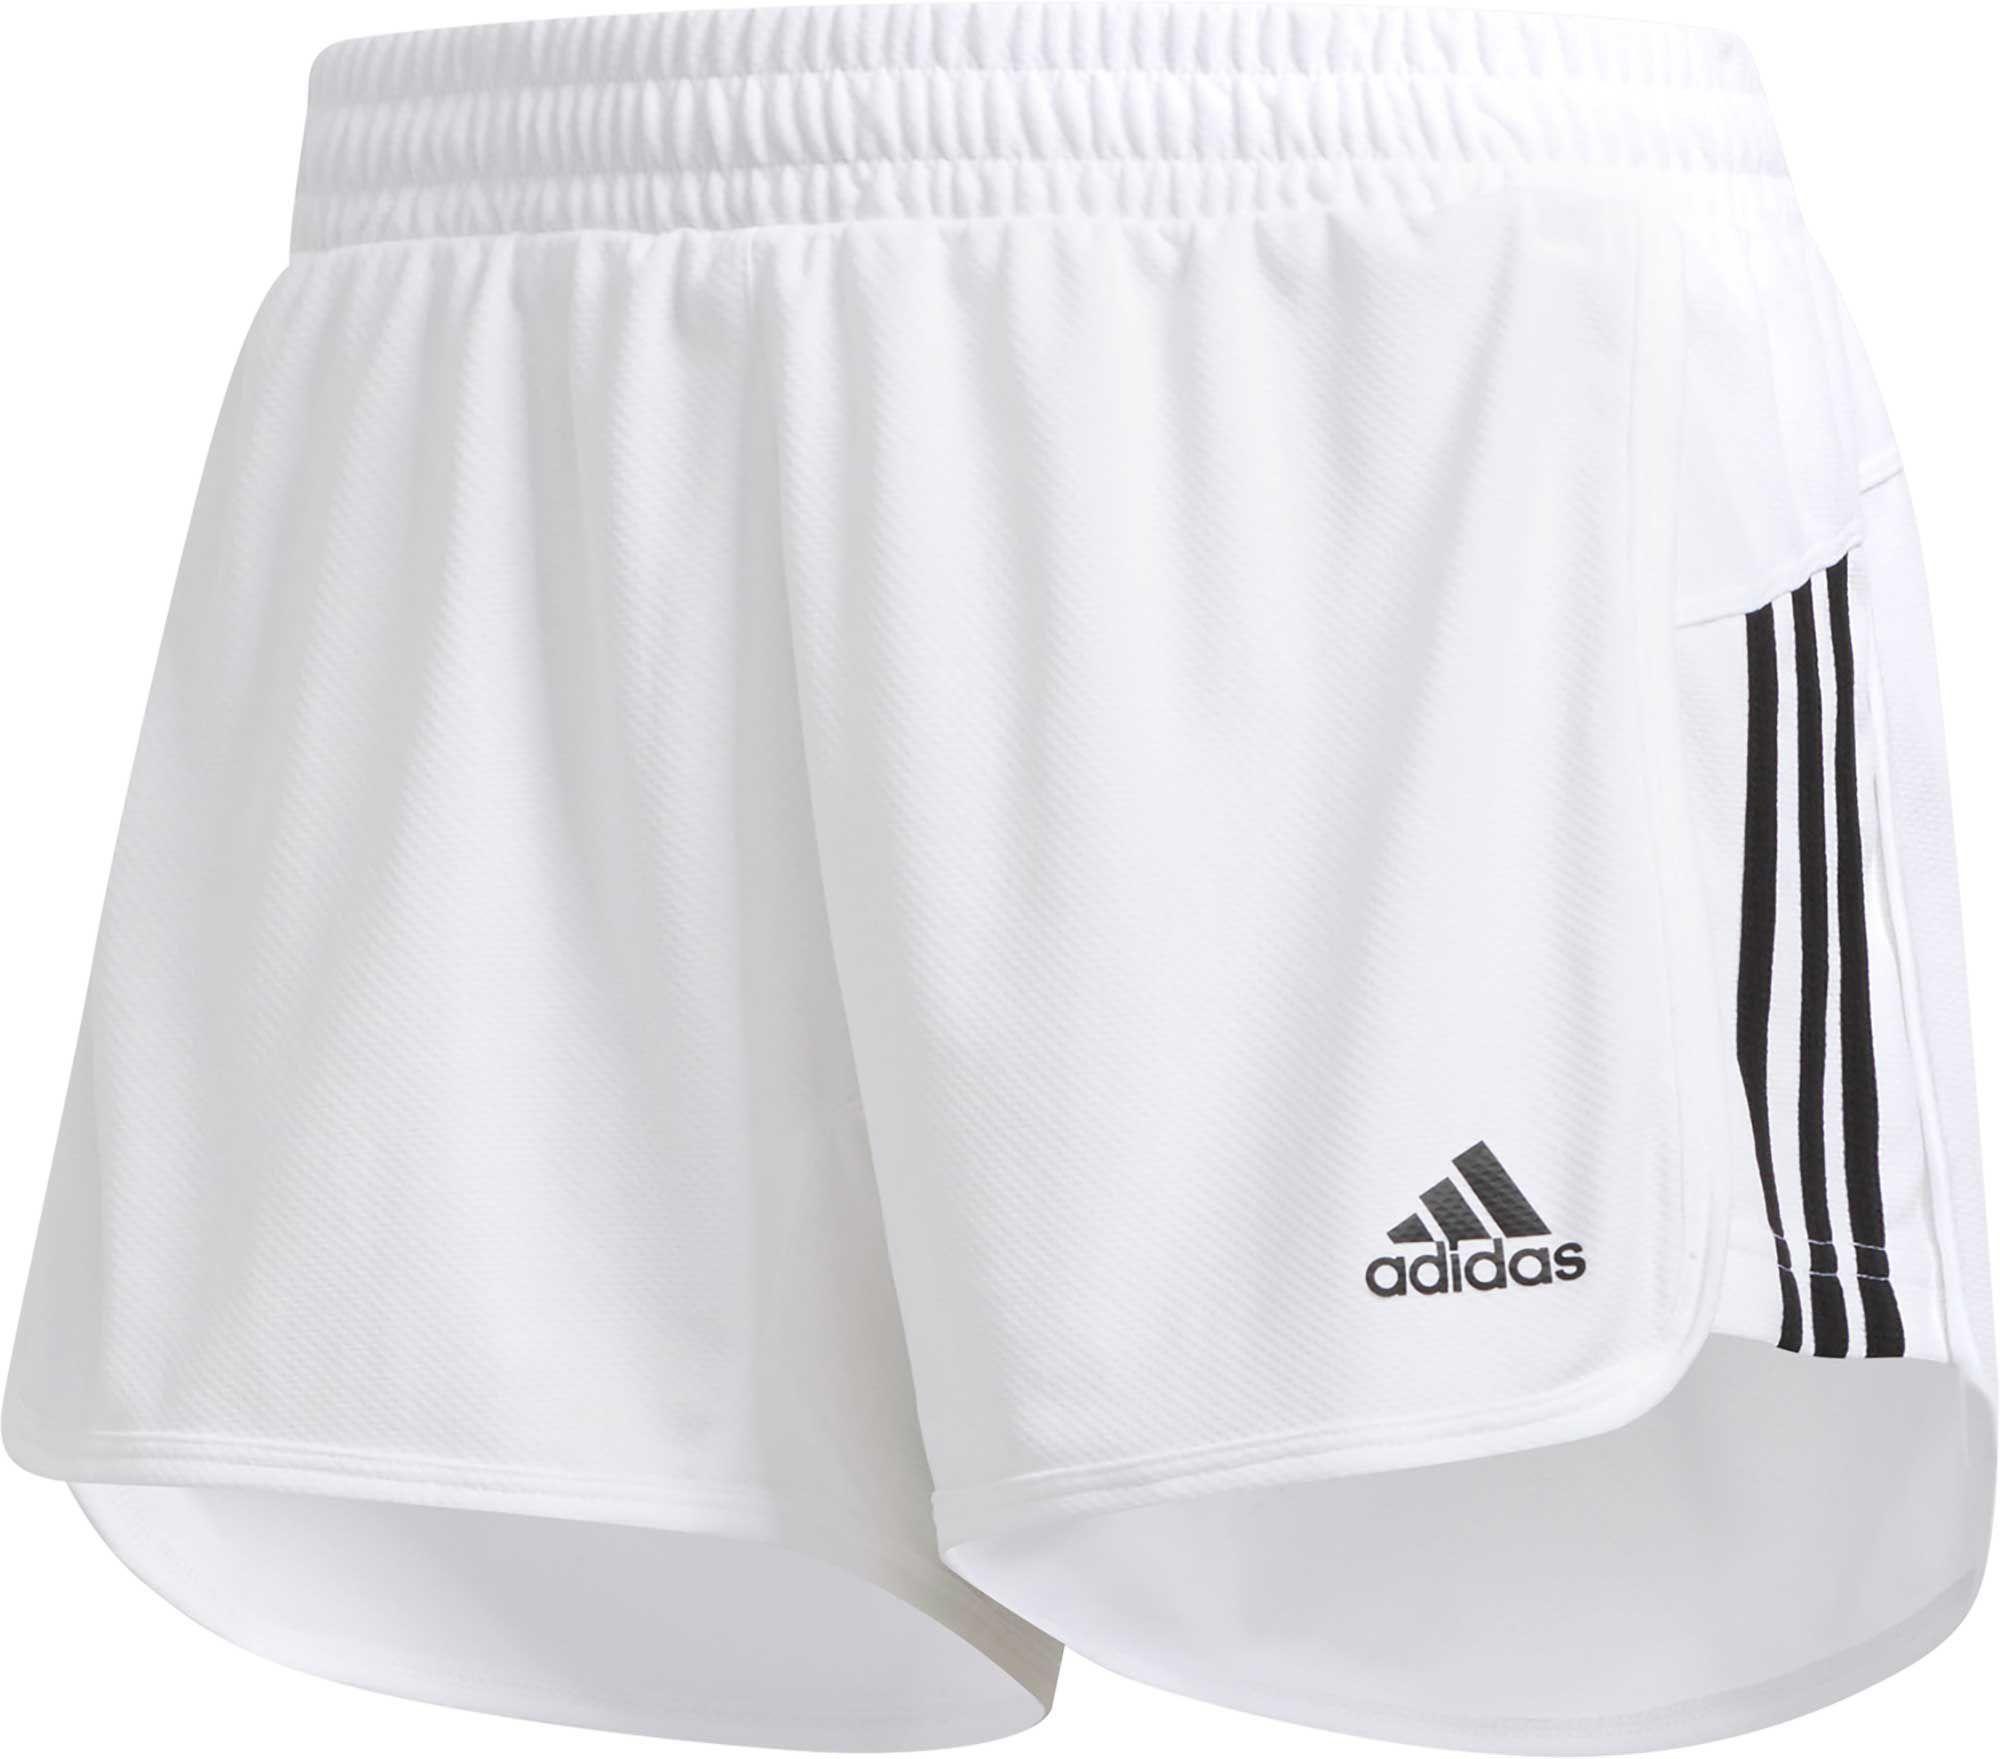 adidas Women's Ultimate Knit Shorts, White   Adidas damen